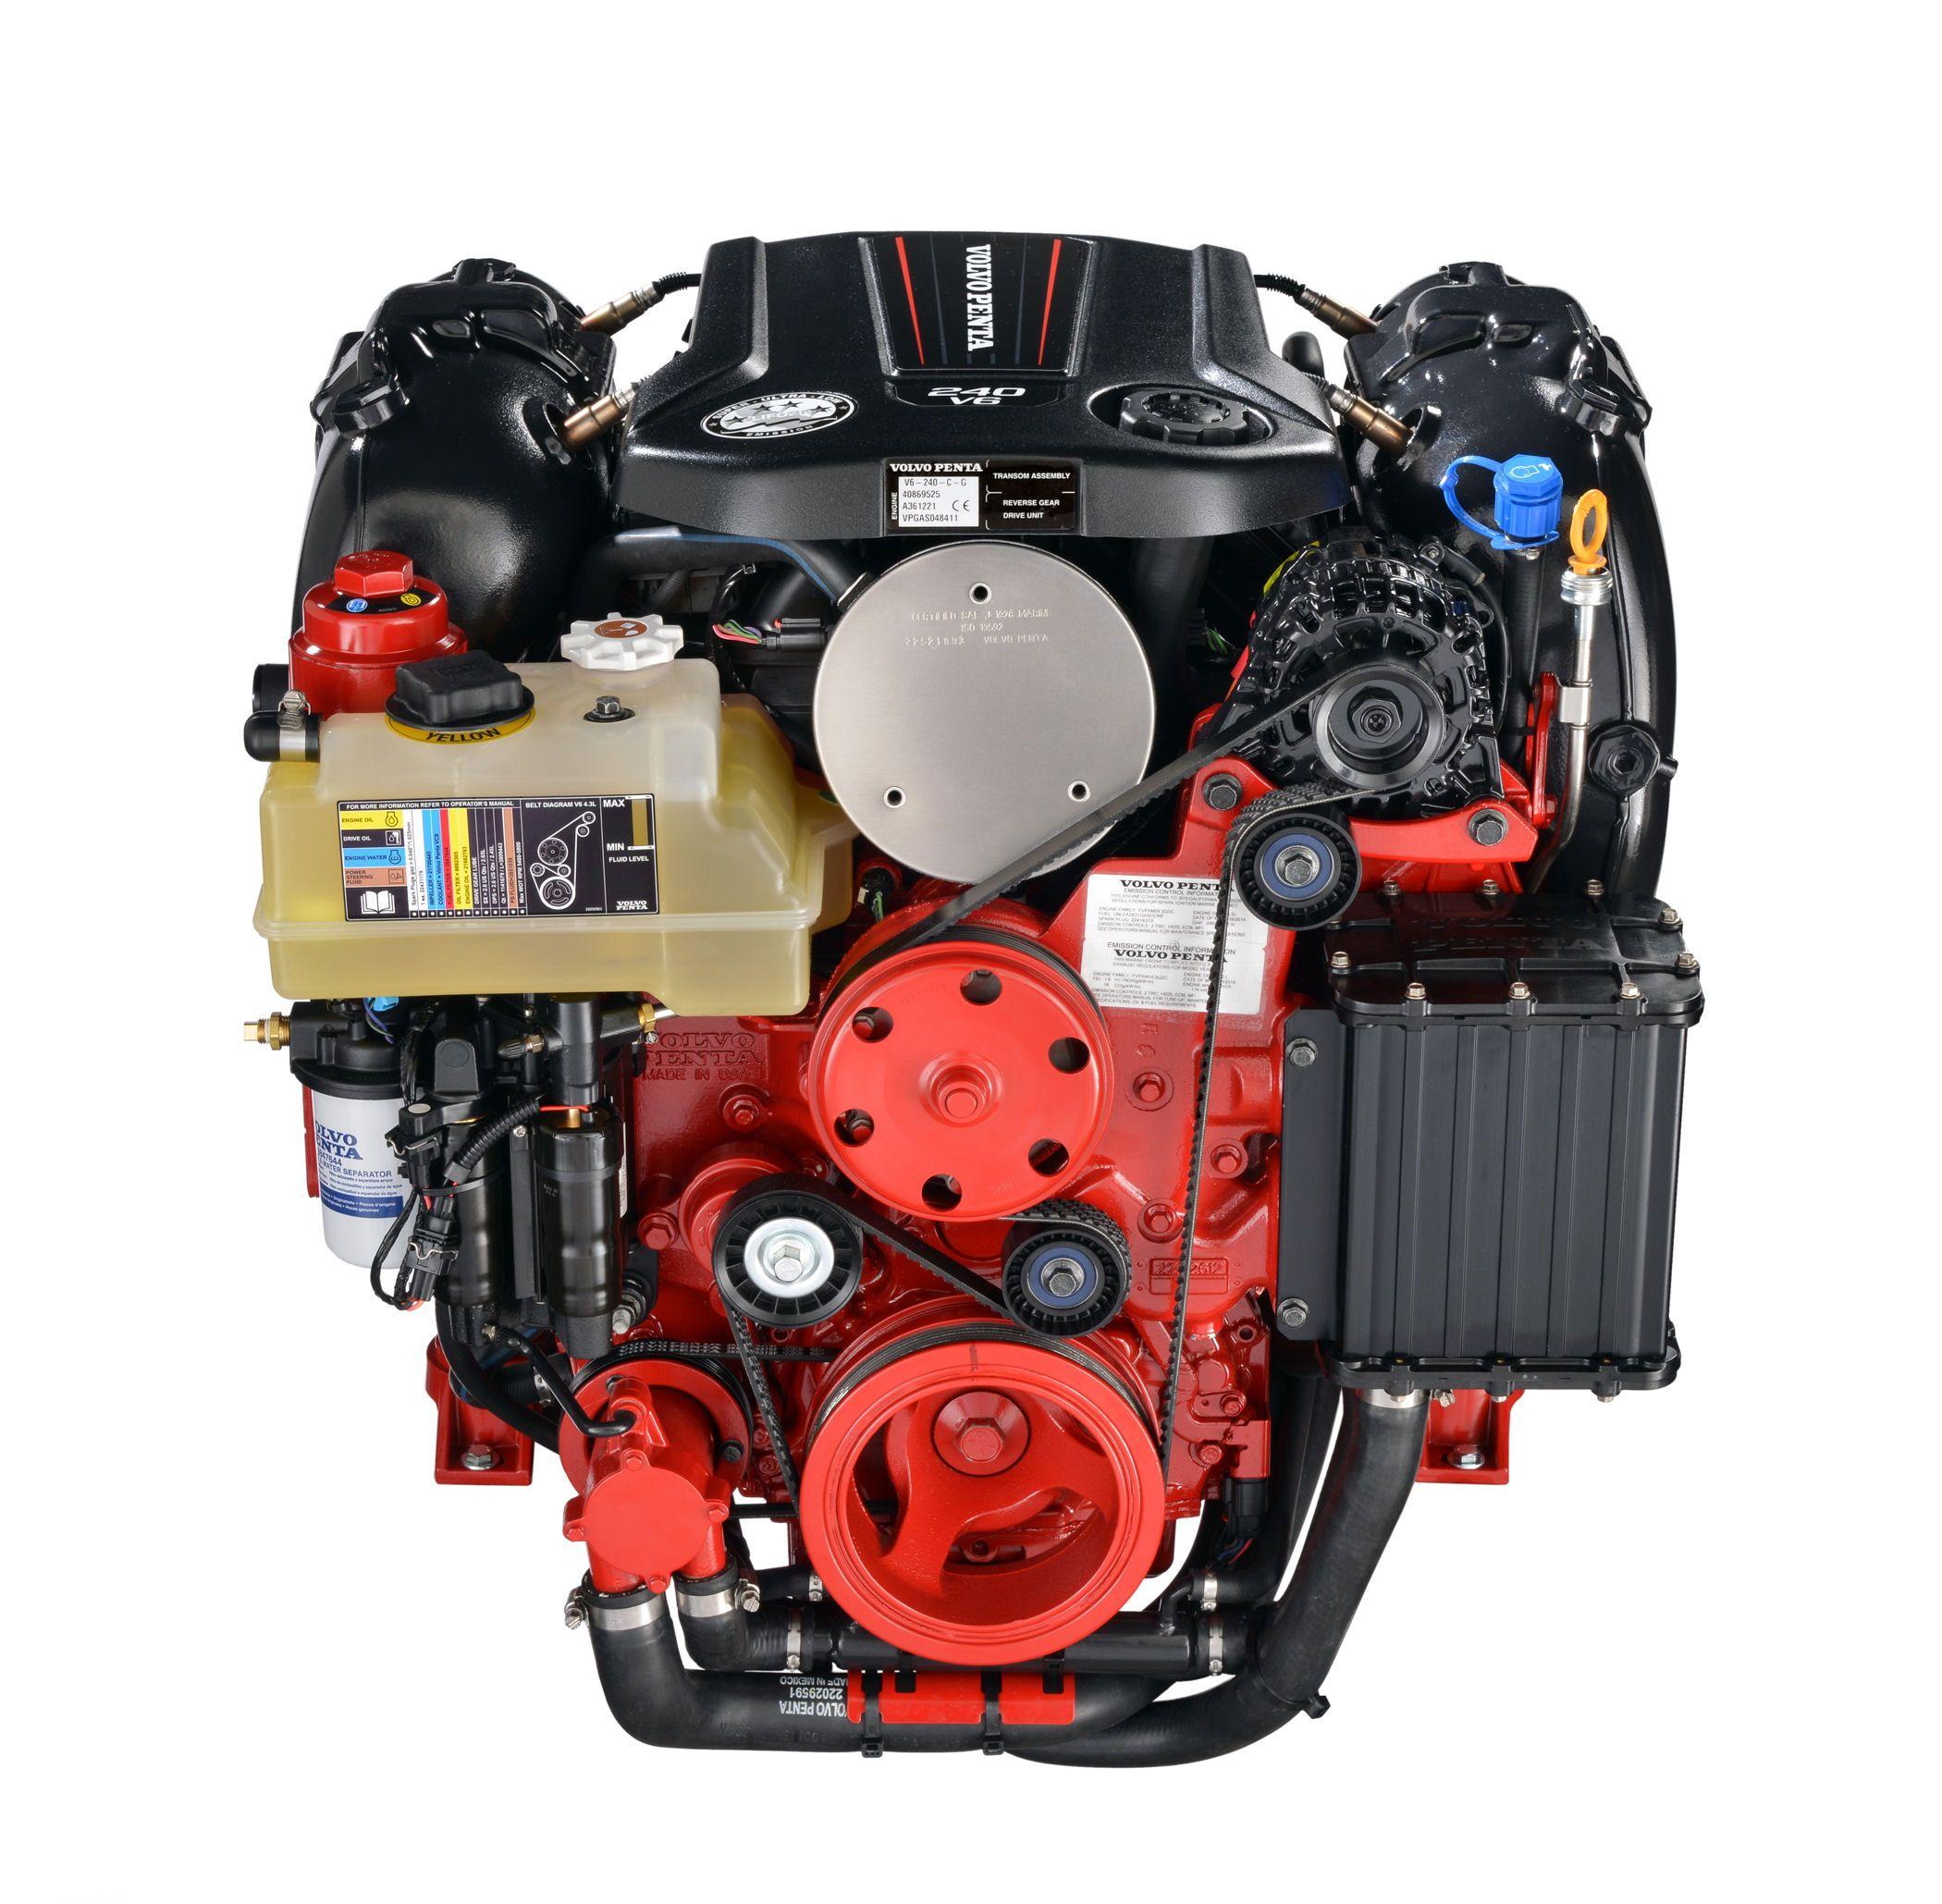 The New Volvo Penta 240 V6 Engine Volvo Sea Design Graphic Card